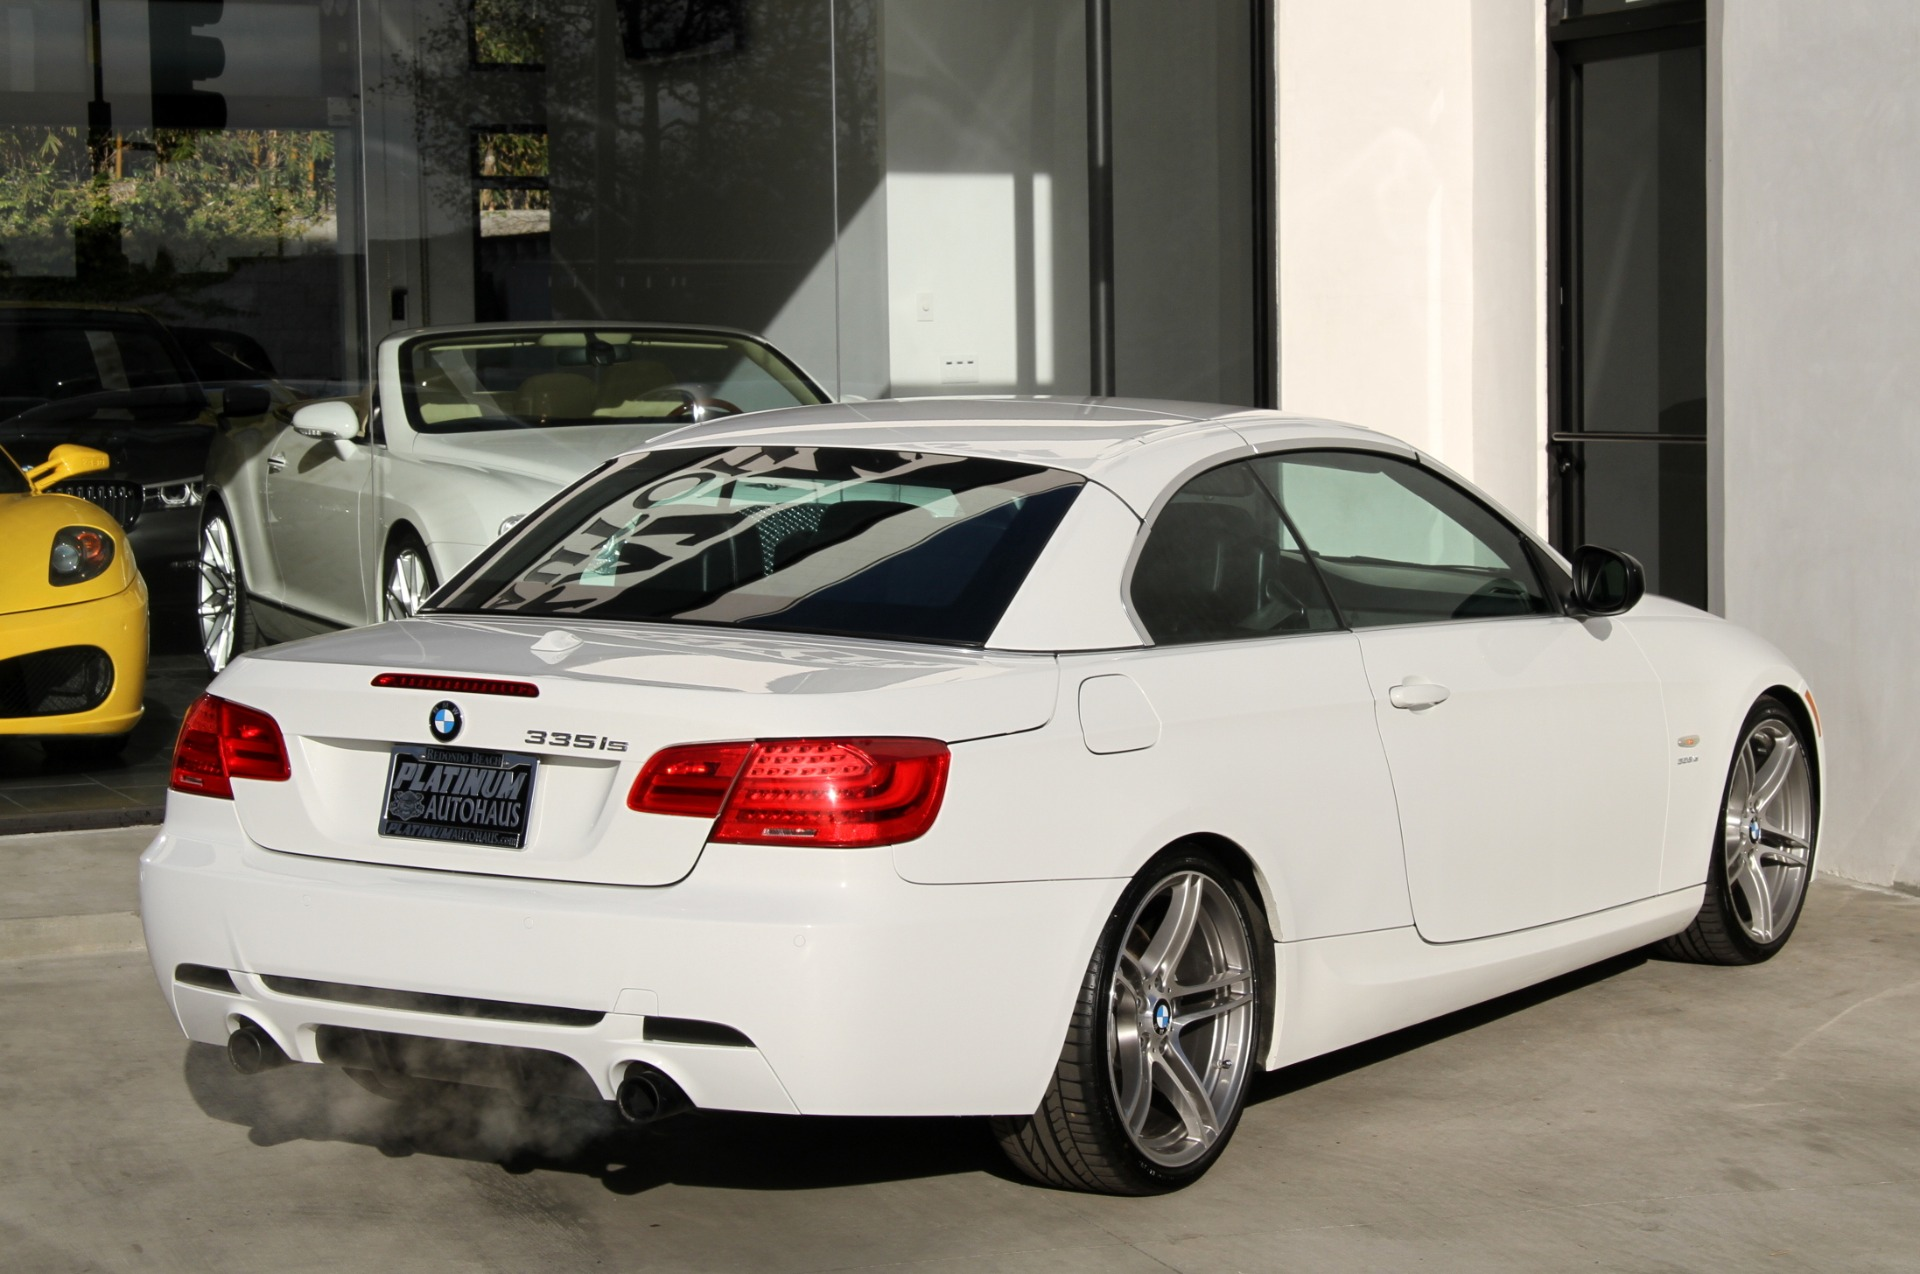 Bmw Dealership Near Me >> 2012 BMW 3 Series 335is Stock # 6064 for sale near Redondo Beach, CA   CA BMW Dealer